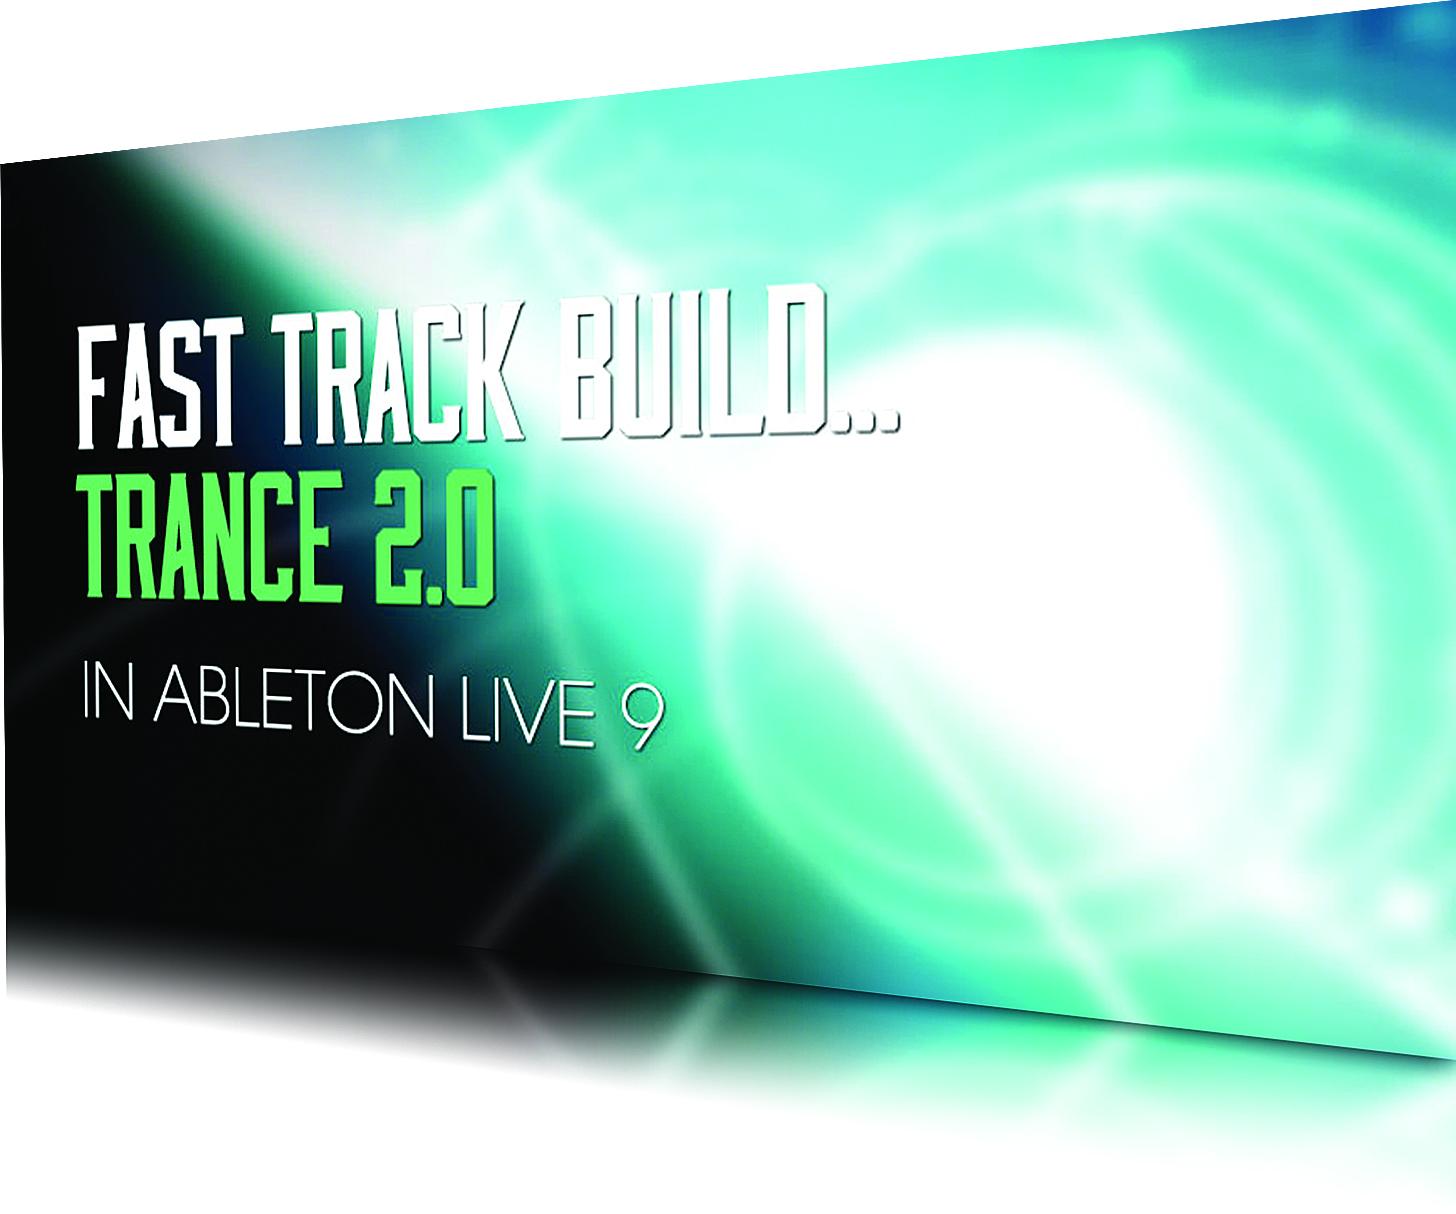 Trance 2.0